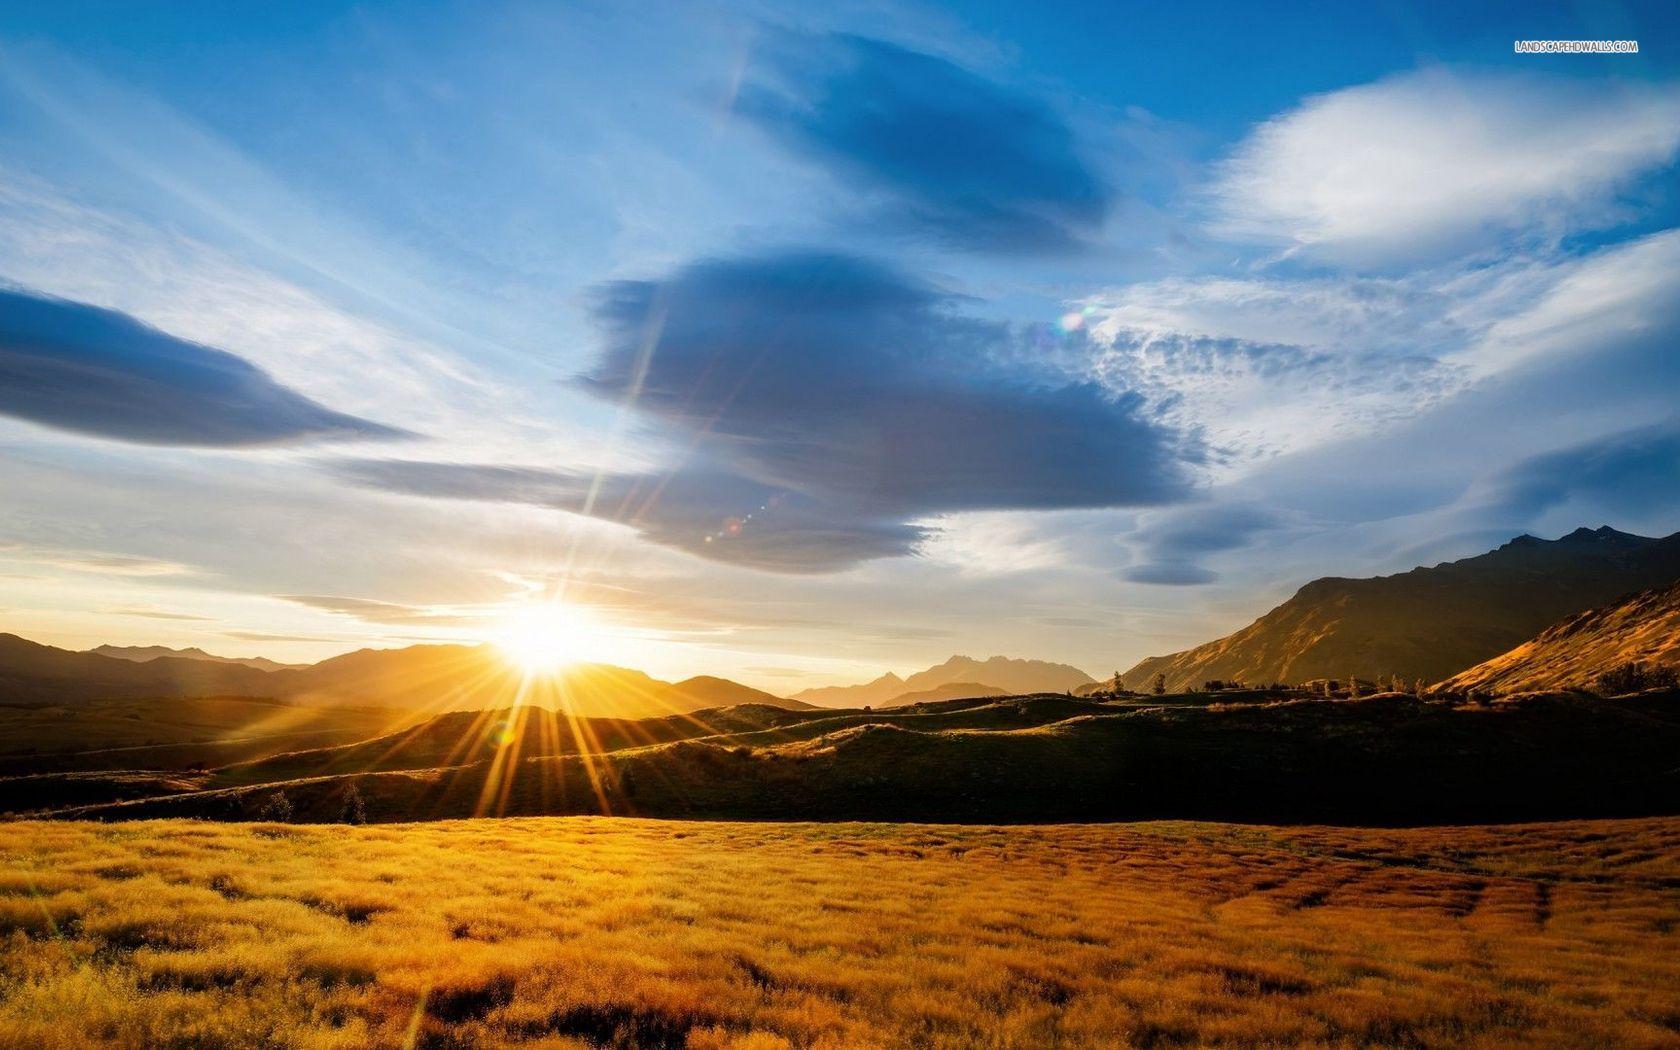 Mountain Sunrise Clipart.